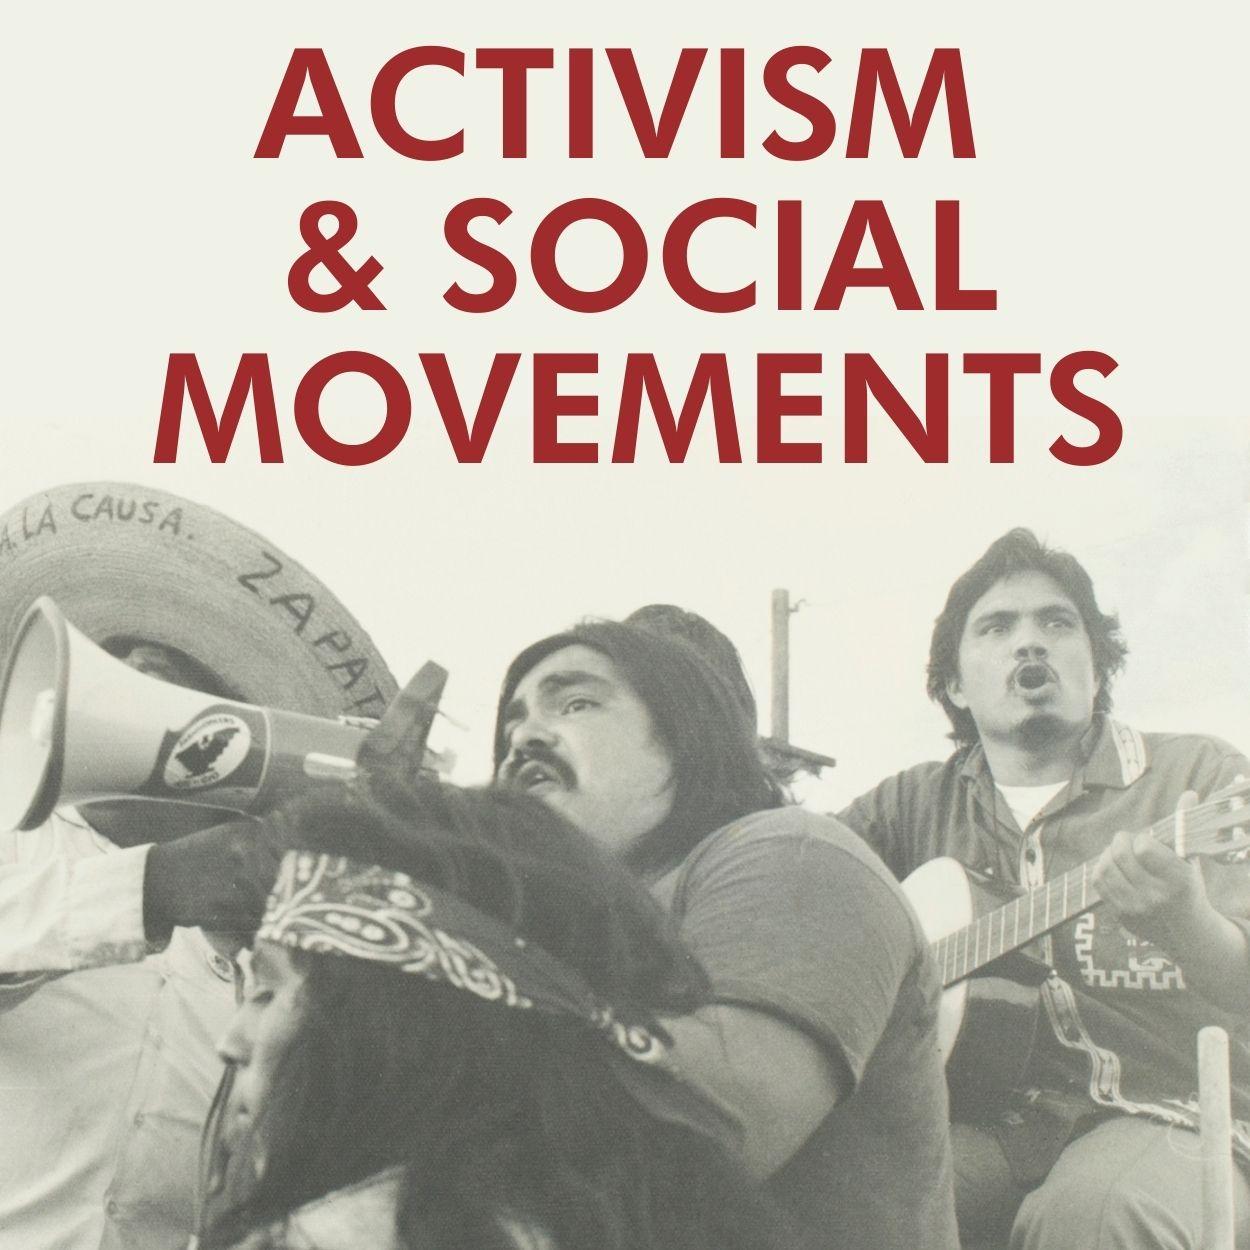 ACTIVISM & SOCIAL CHANGE (3)